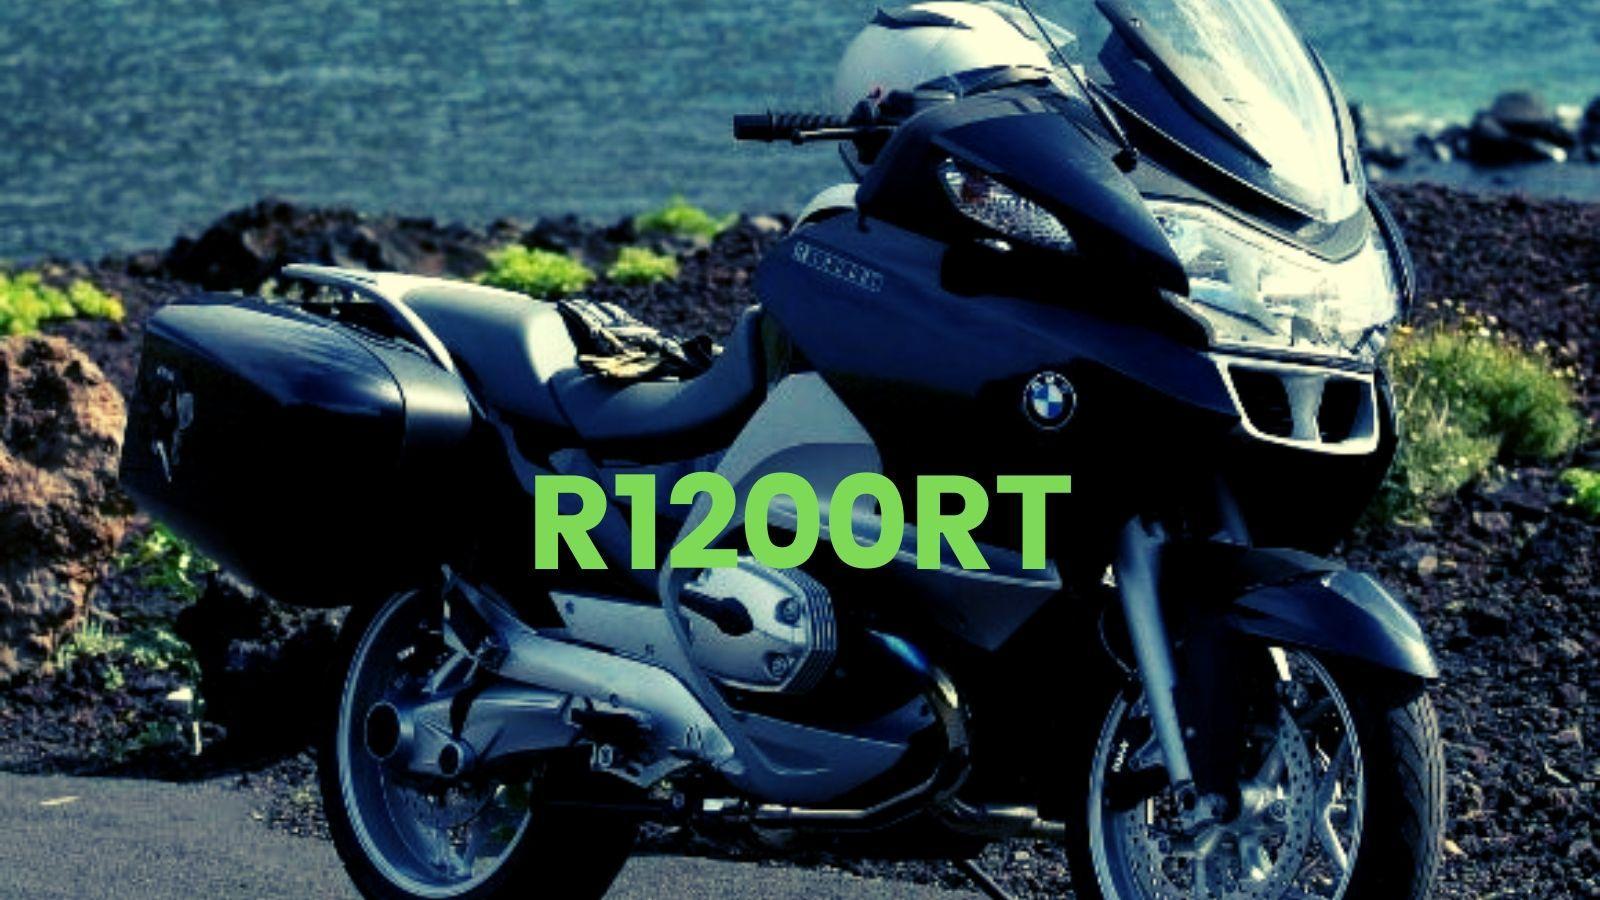 R1200RT kapak